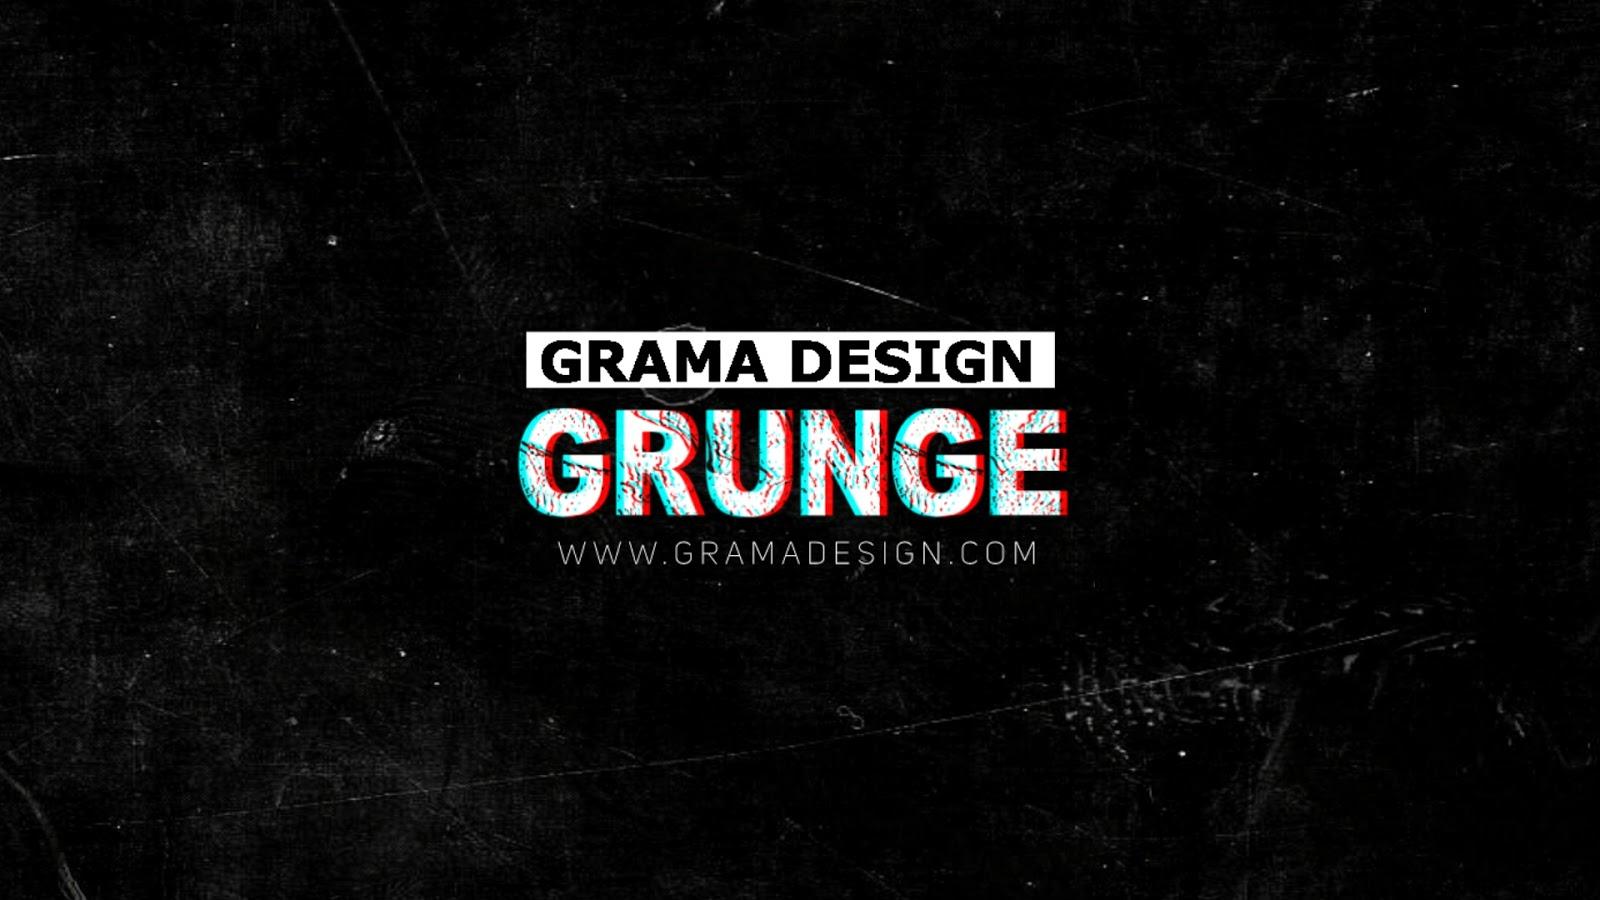 grunge glitch logo free intro template sony vegas pro 4k